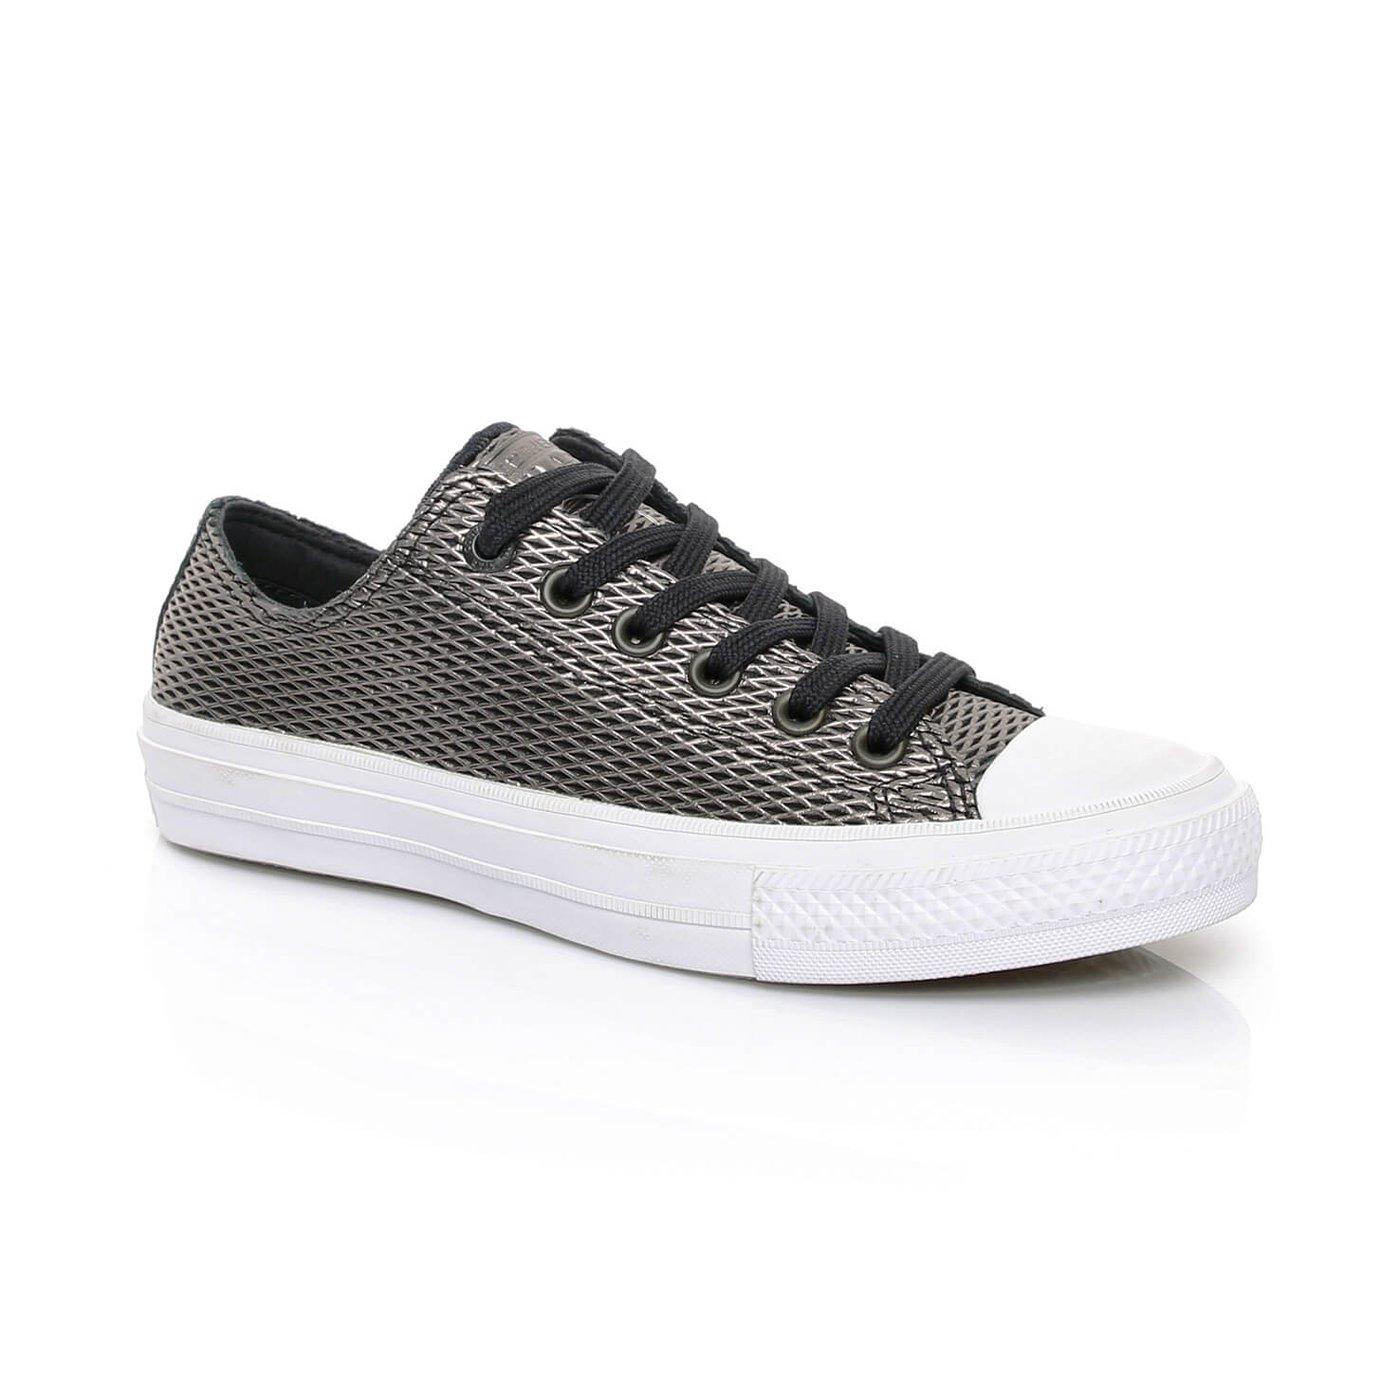 Converse Chuck Taylor All Star II Kadın Siyah Sneaker